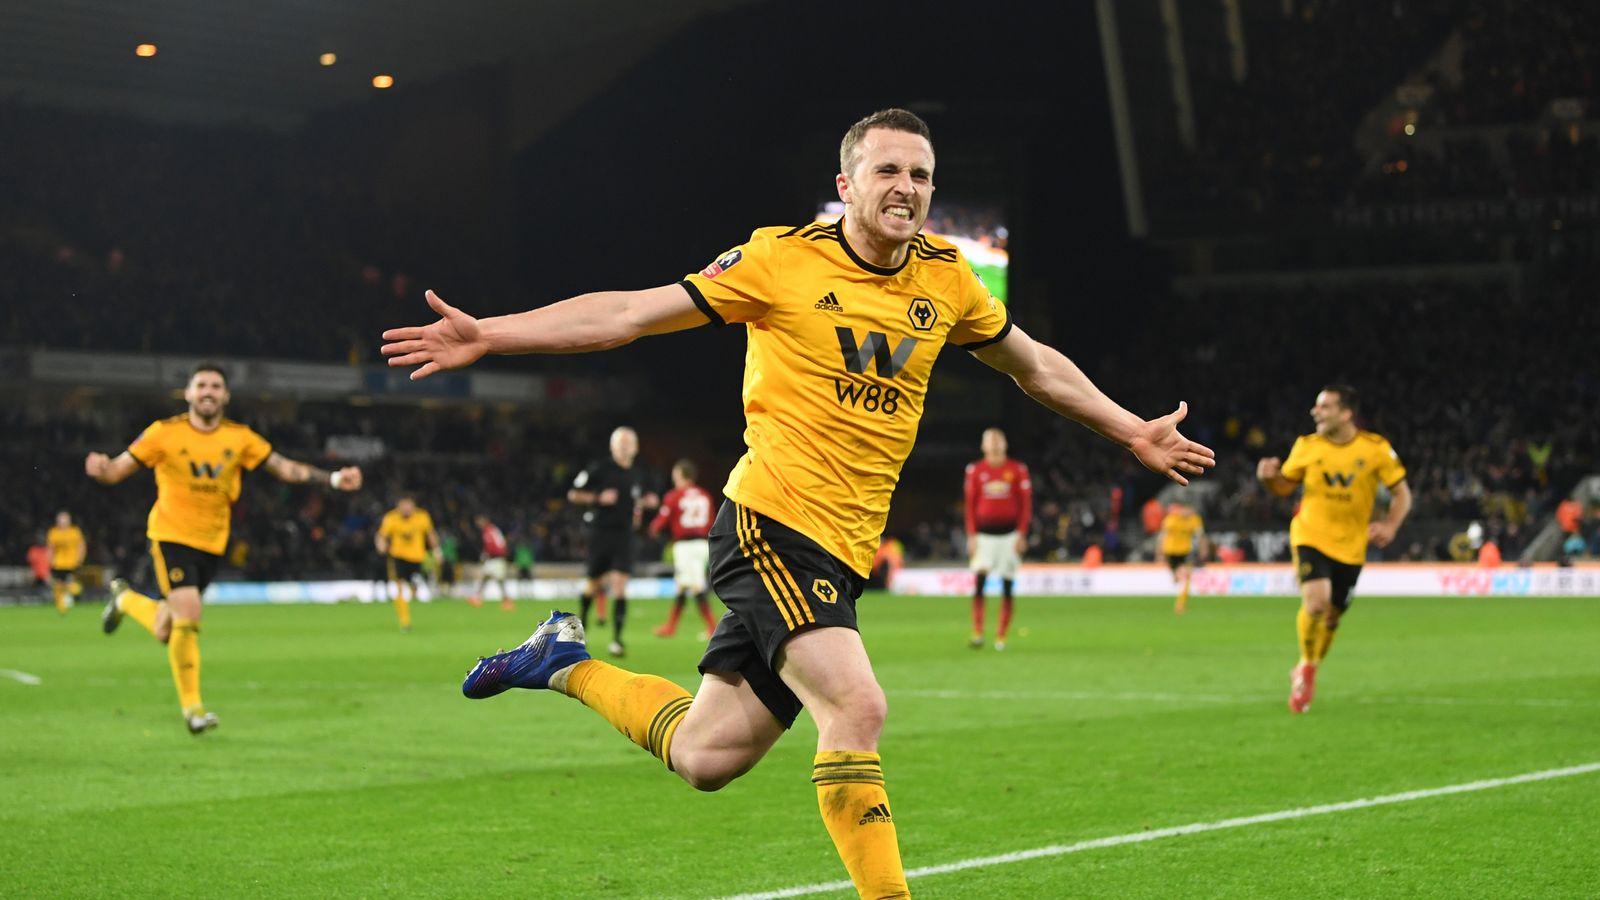 e07fc67ddf9 Wolves 2 - 1 Man Utd - Match Report   Highlights